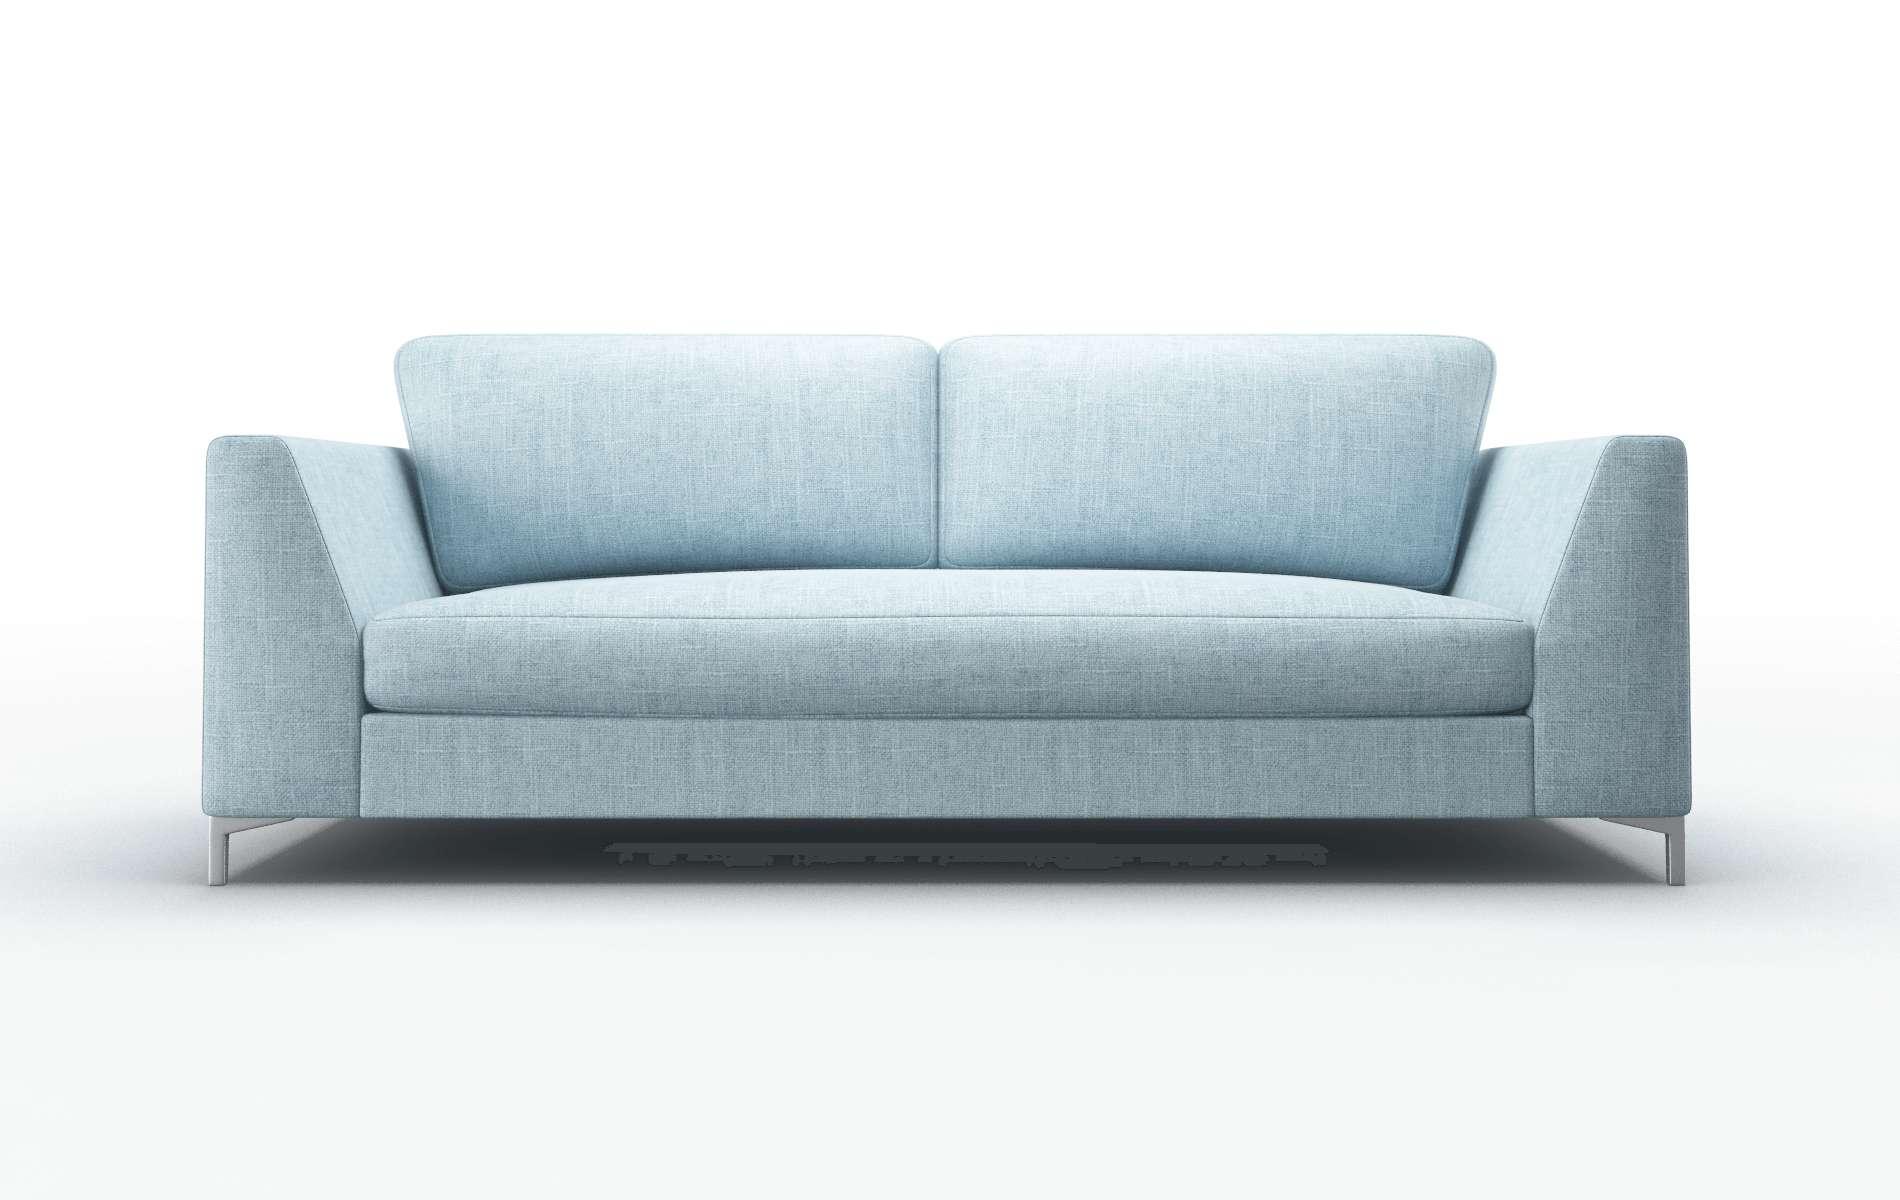 Royal Atlas Turquoise Sofa metal legs